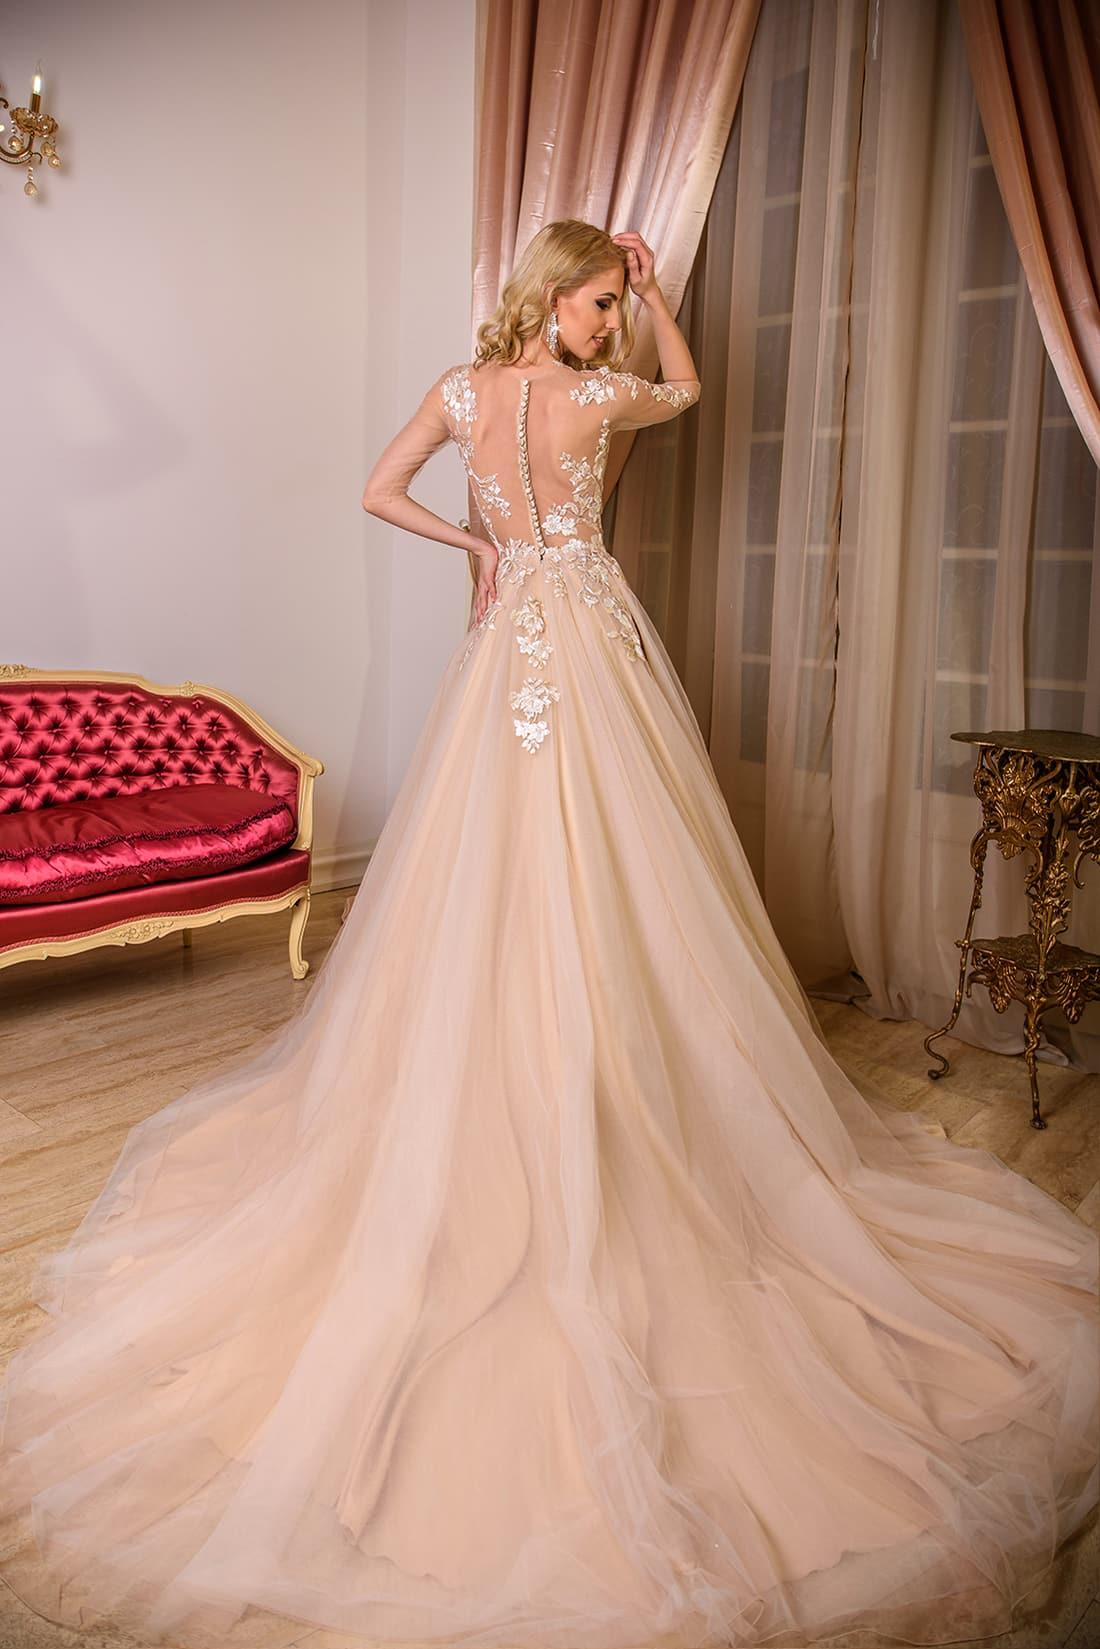 Nisa Model - Colectia Baroque - Adora Sposa (2)